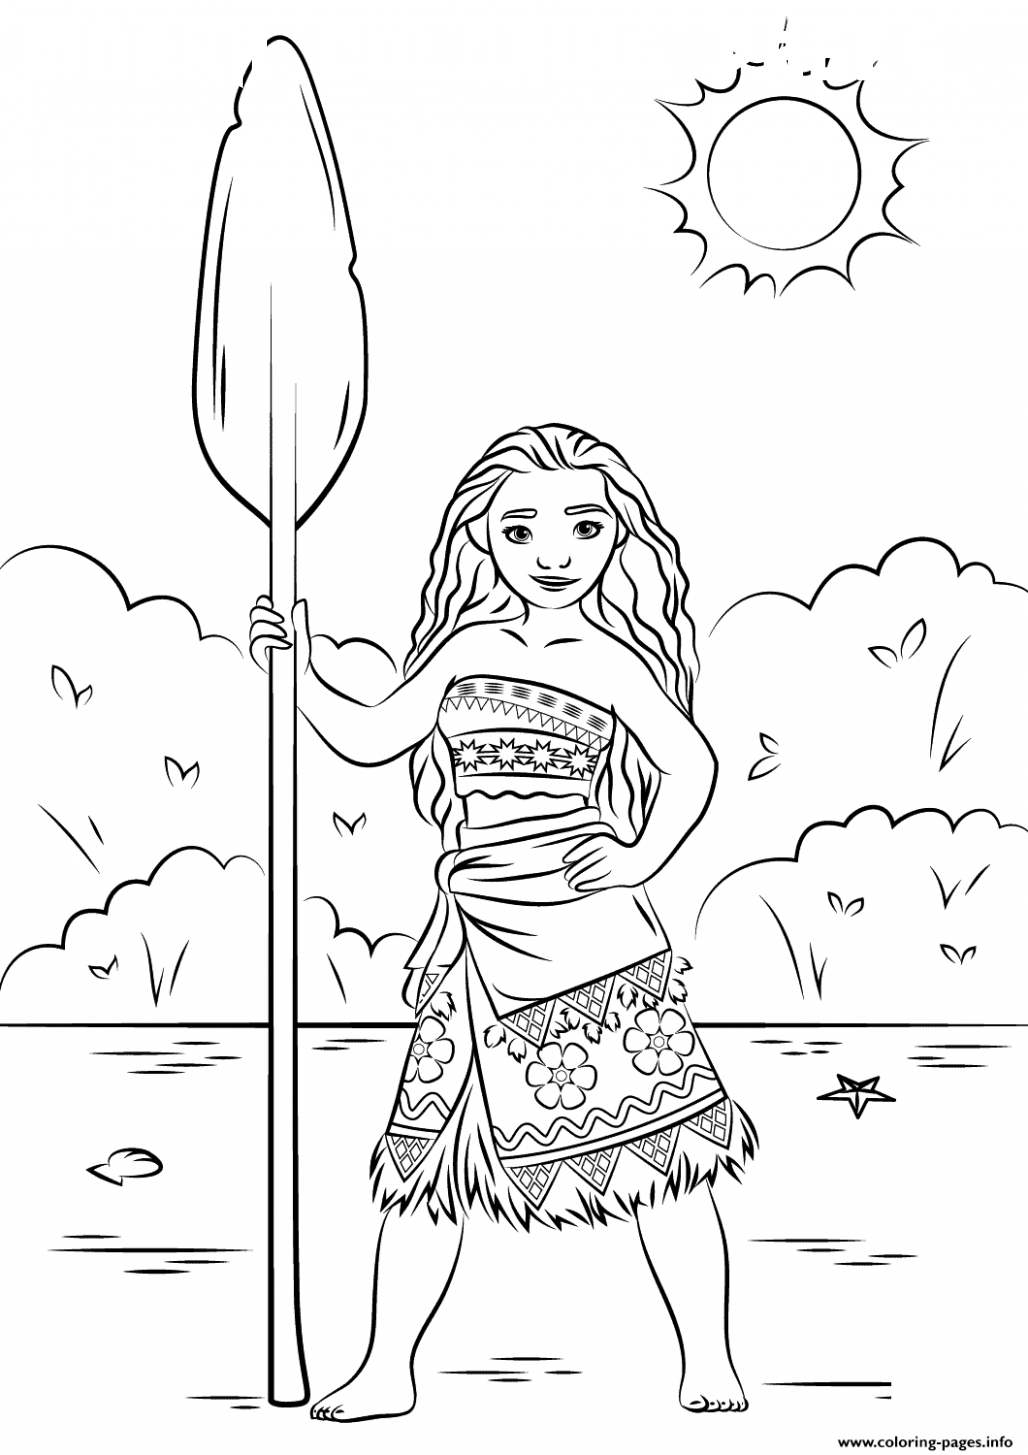 12 Moana Coloring Pages Disney Princess Coloring Pages Moana Coloring Pages Princess Coloring Pages